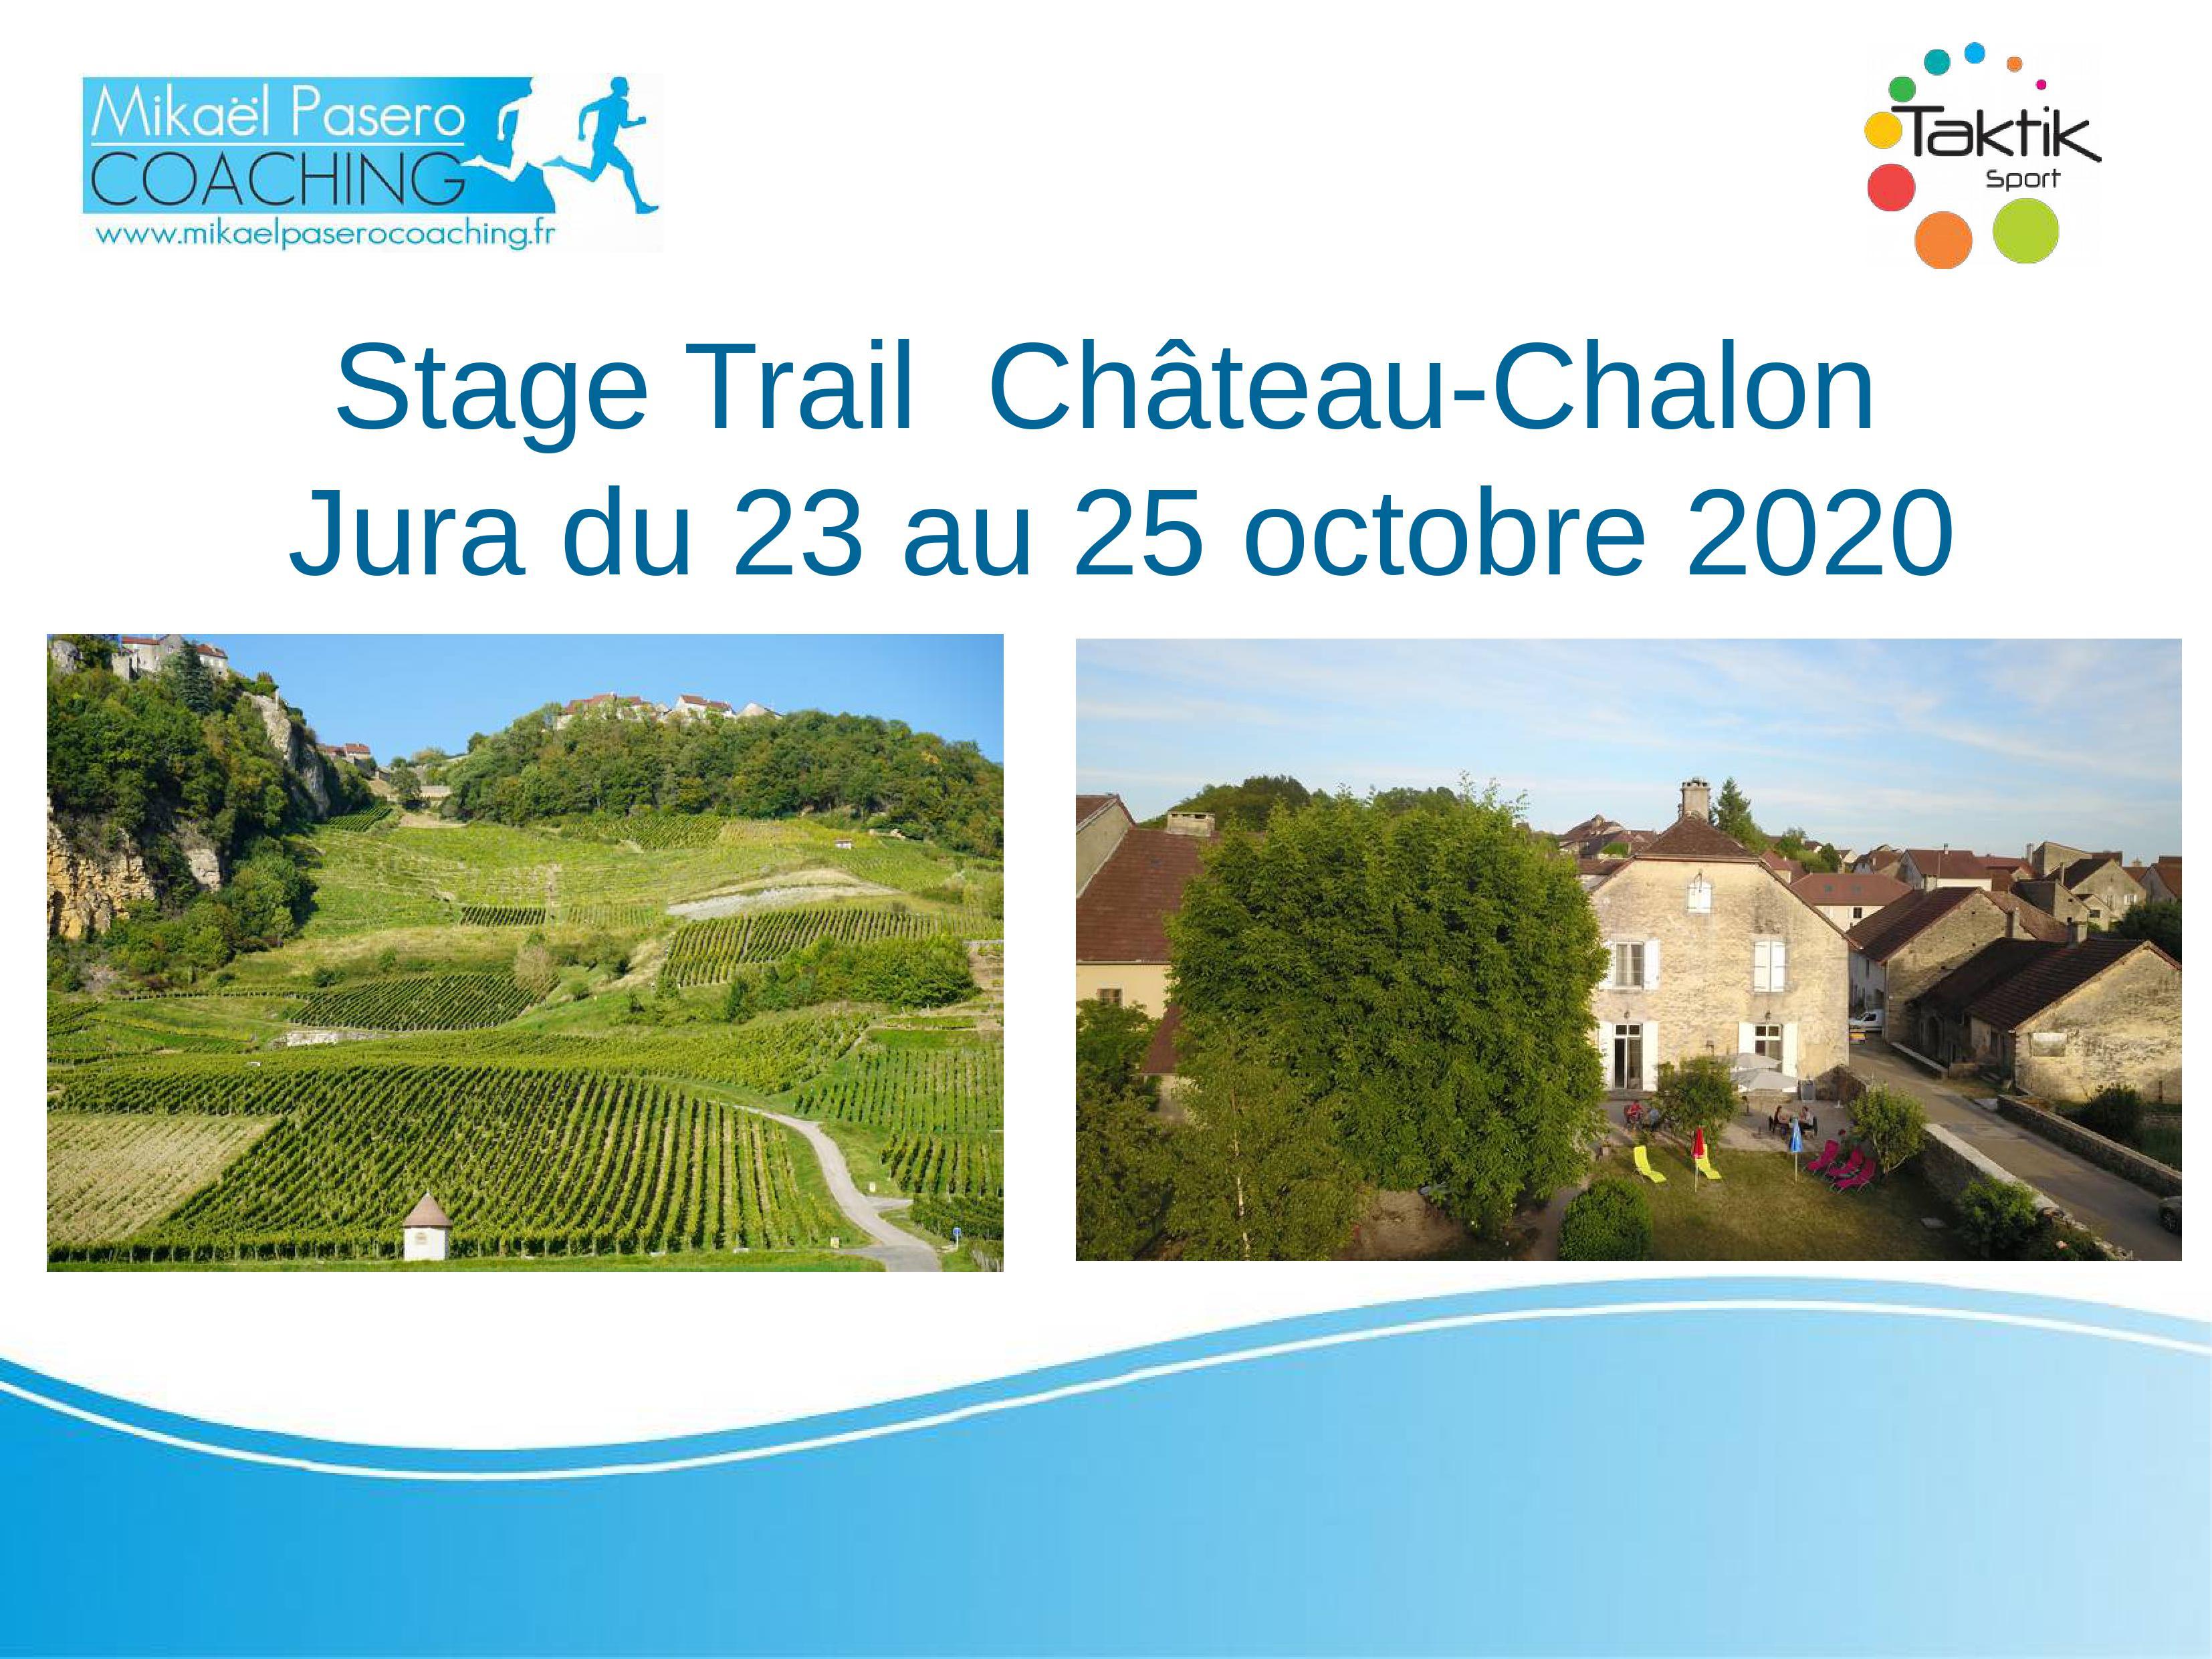 0001 - STAGE TRAIL AVEC MIKAEL ET MATHIEU PASERO 23-25 OCTOBRE 2020 JURA